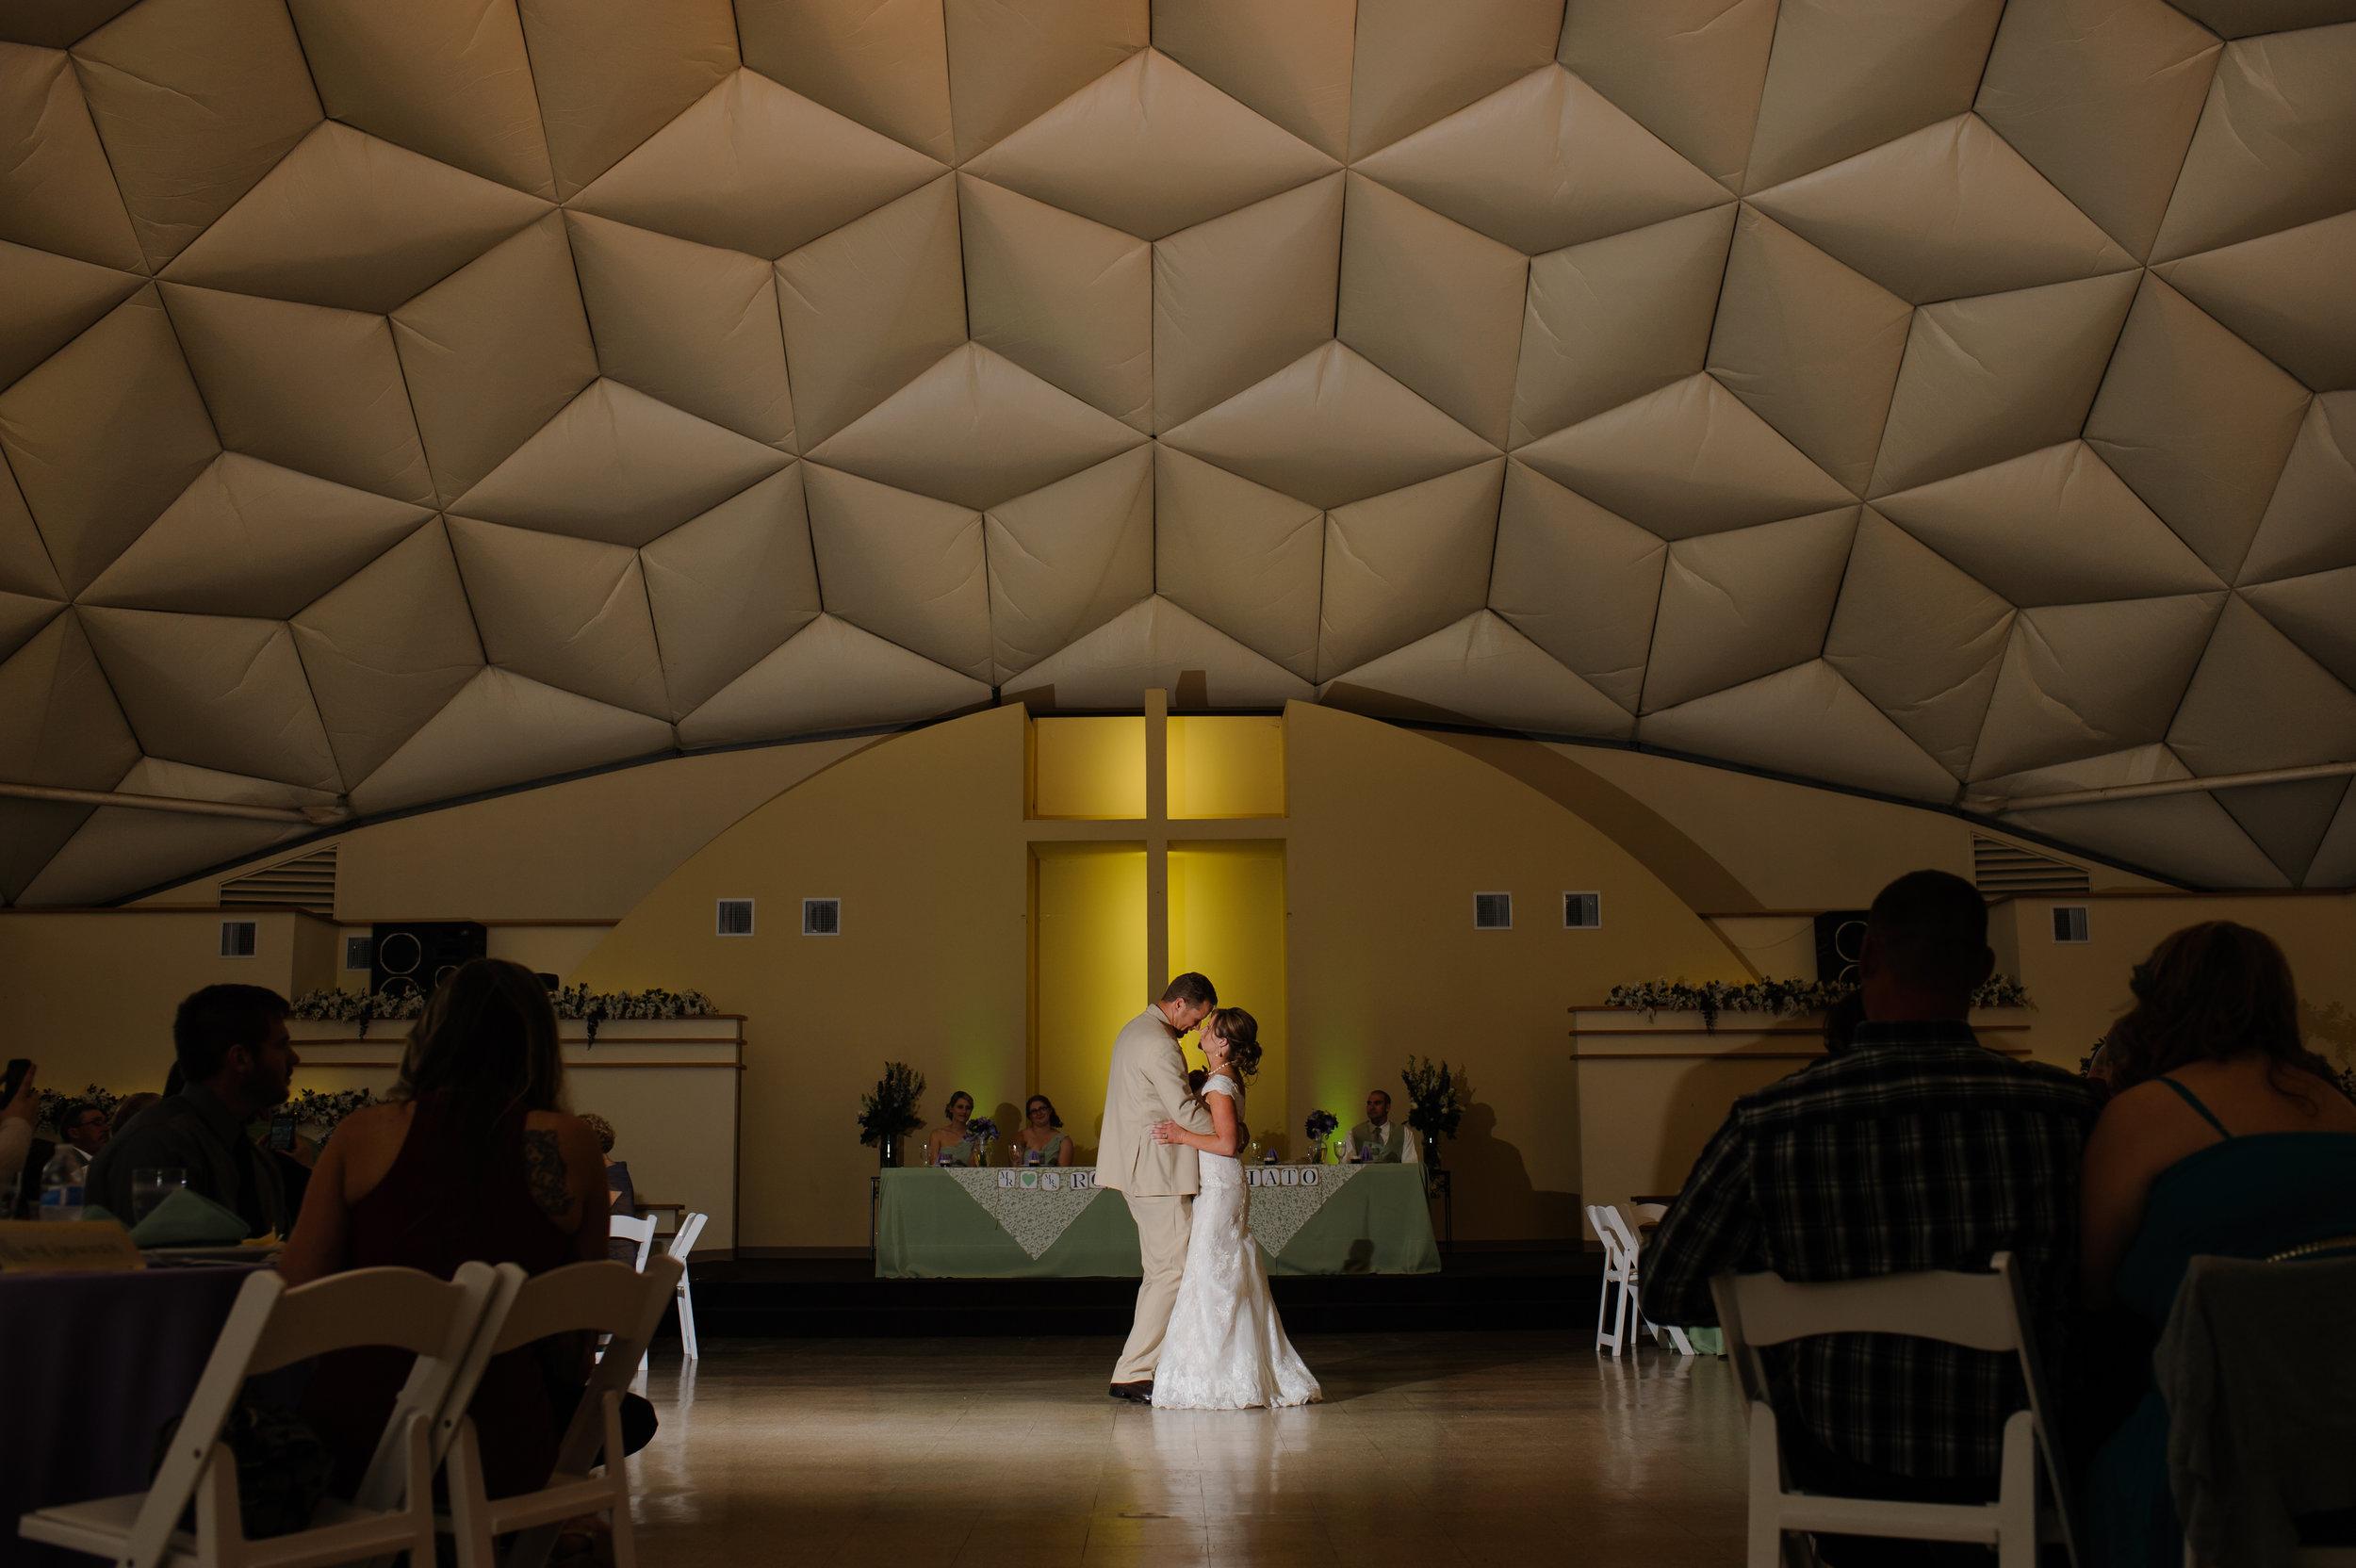 danielle-ross-018-sacramento-wedding-photographer-katherine-nicole-photography.JPG